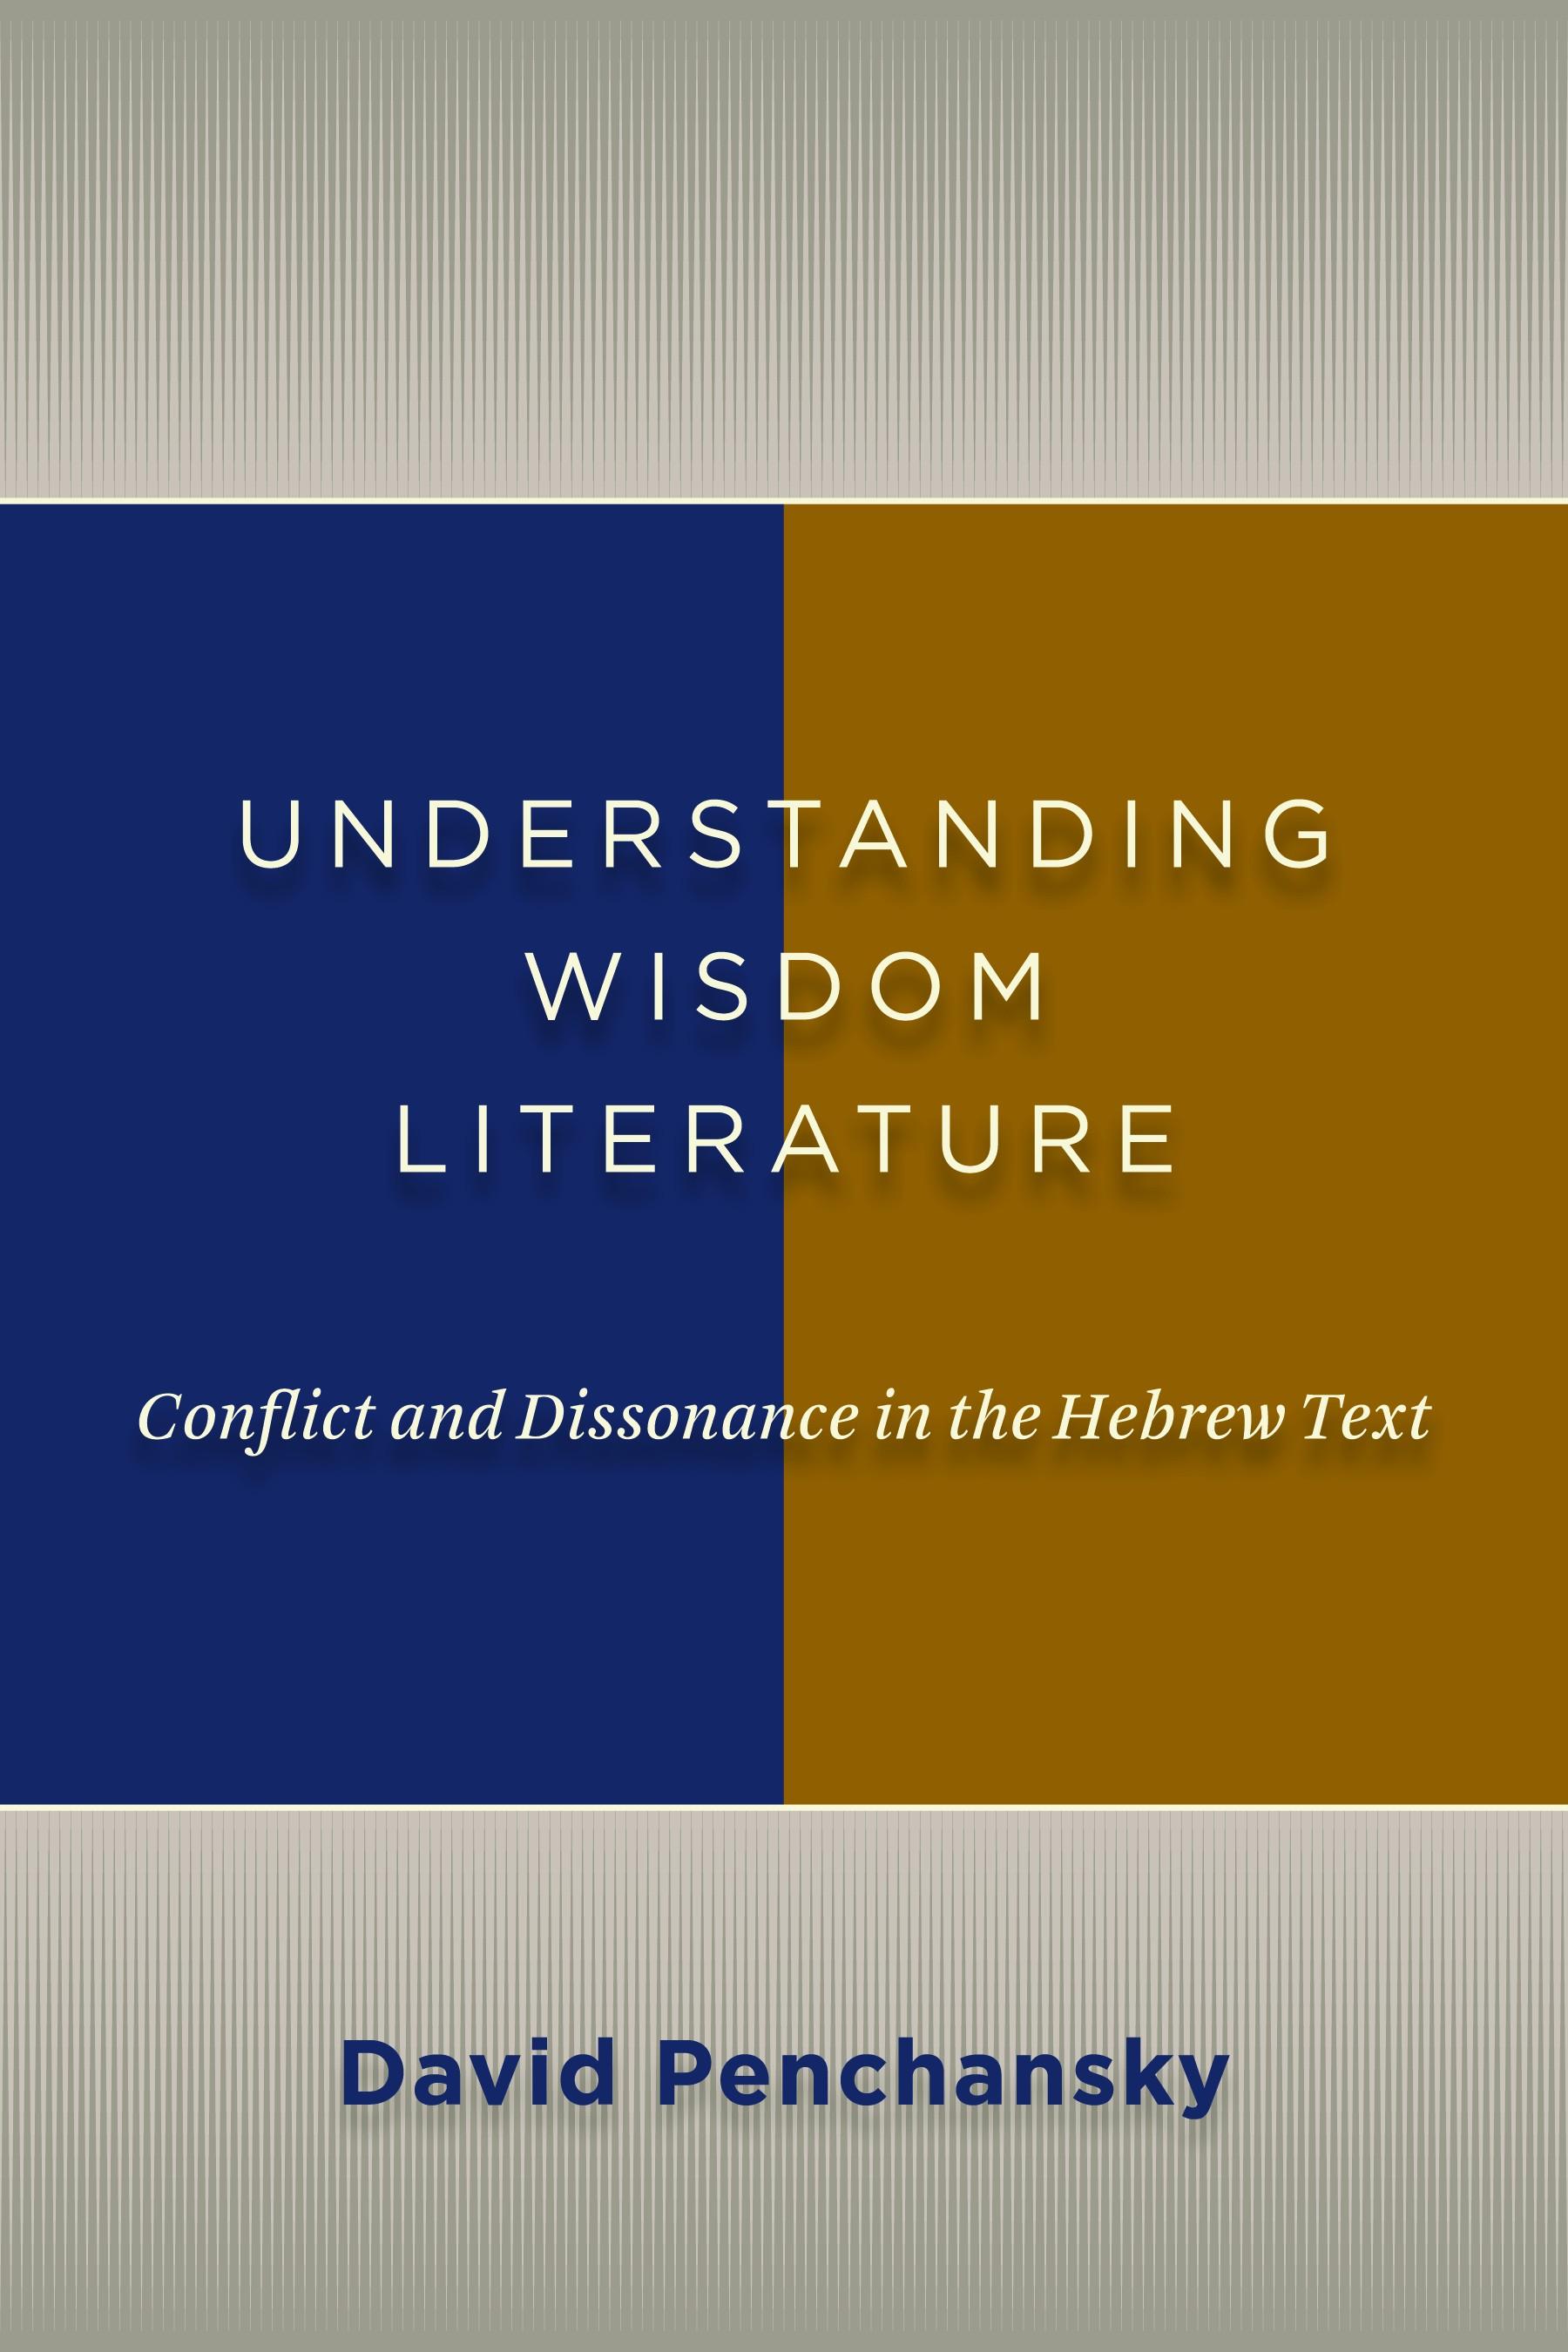 essay on wisdom literature